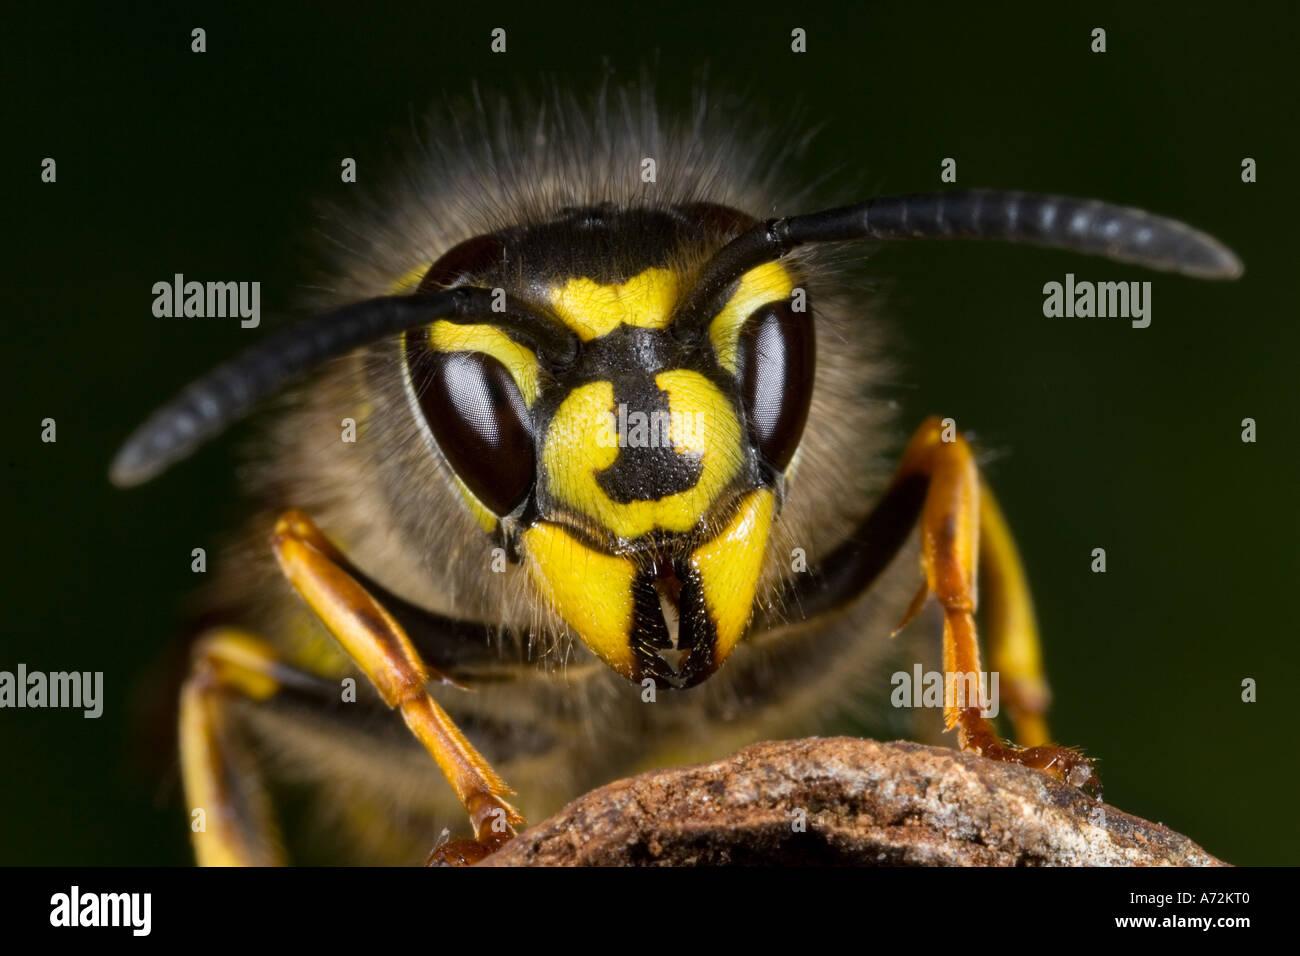 Avispa común Vespula vulgaris vista detalle de cabeza mostrando signos distintivos potton bedfordshire Imagen De Stock